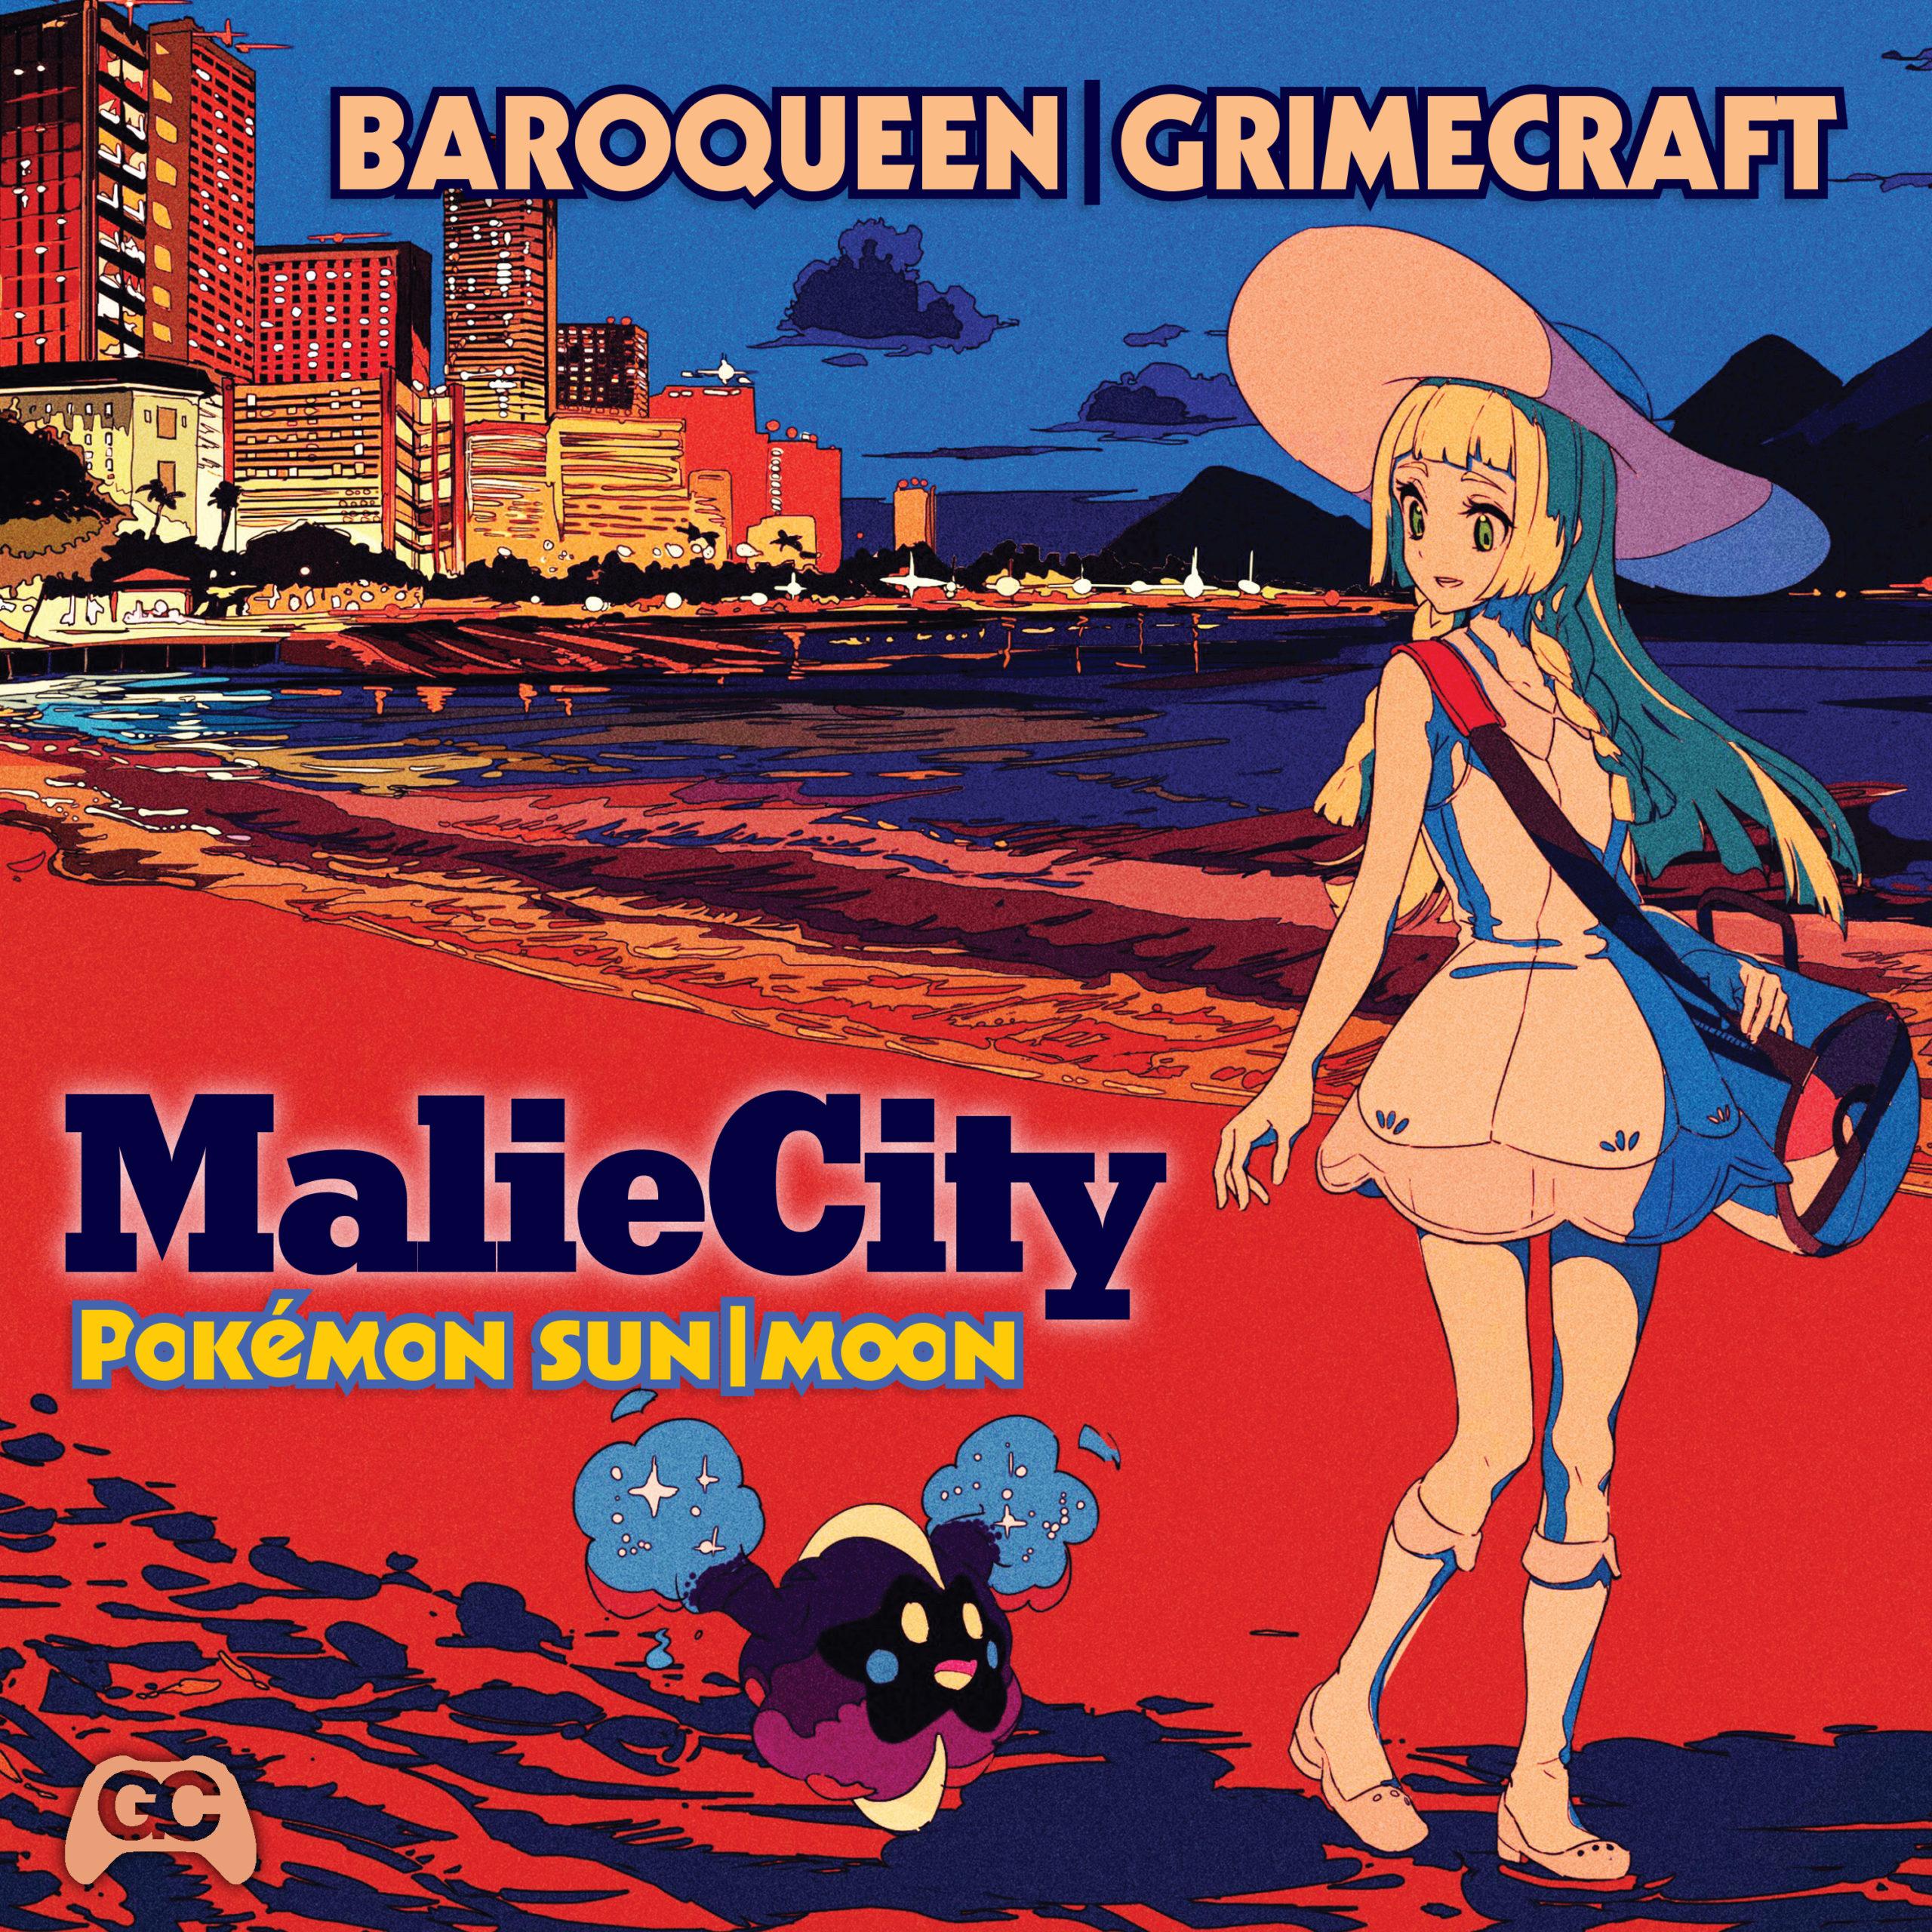 Grimecraft x Baroqueen – Malie City